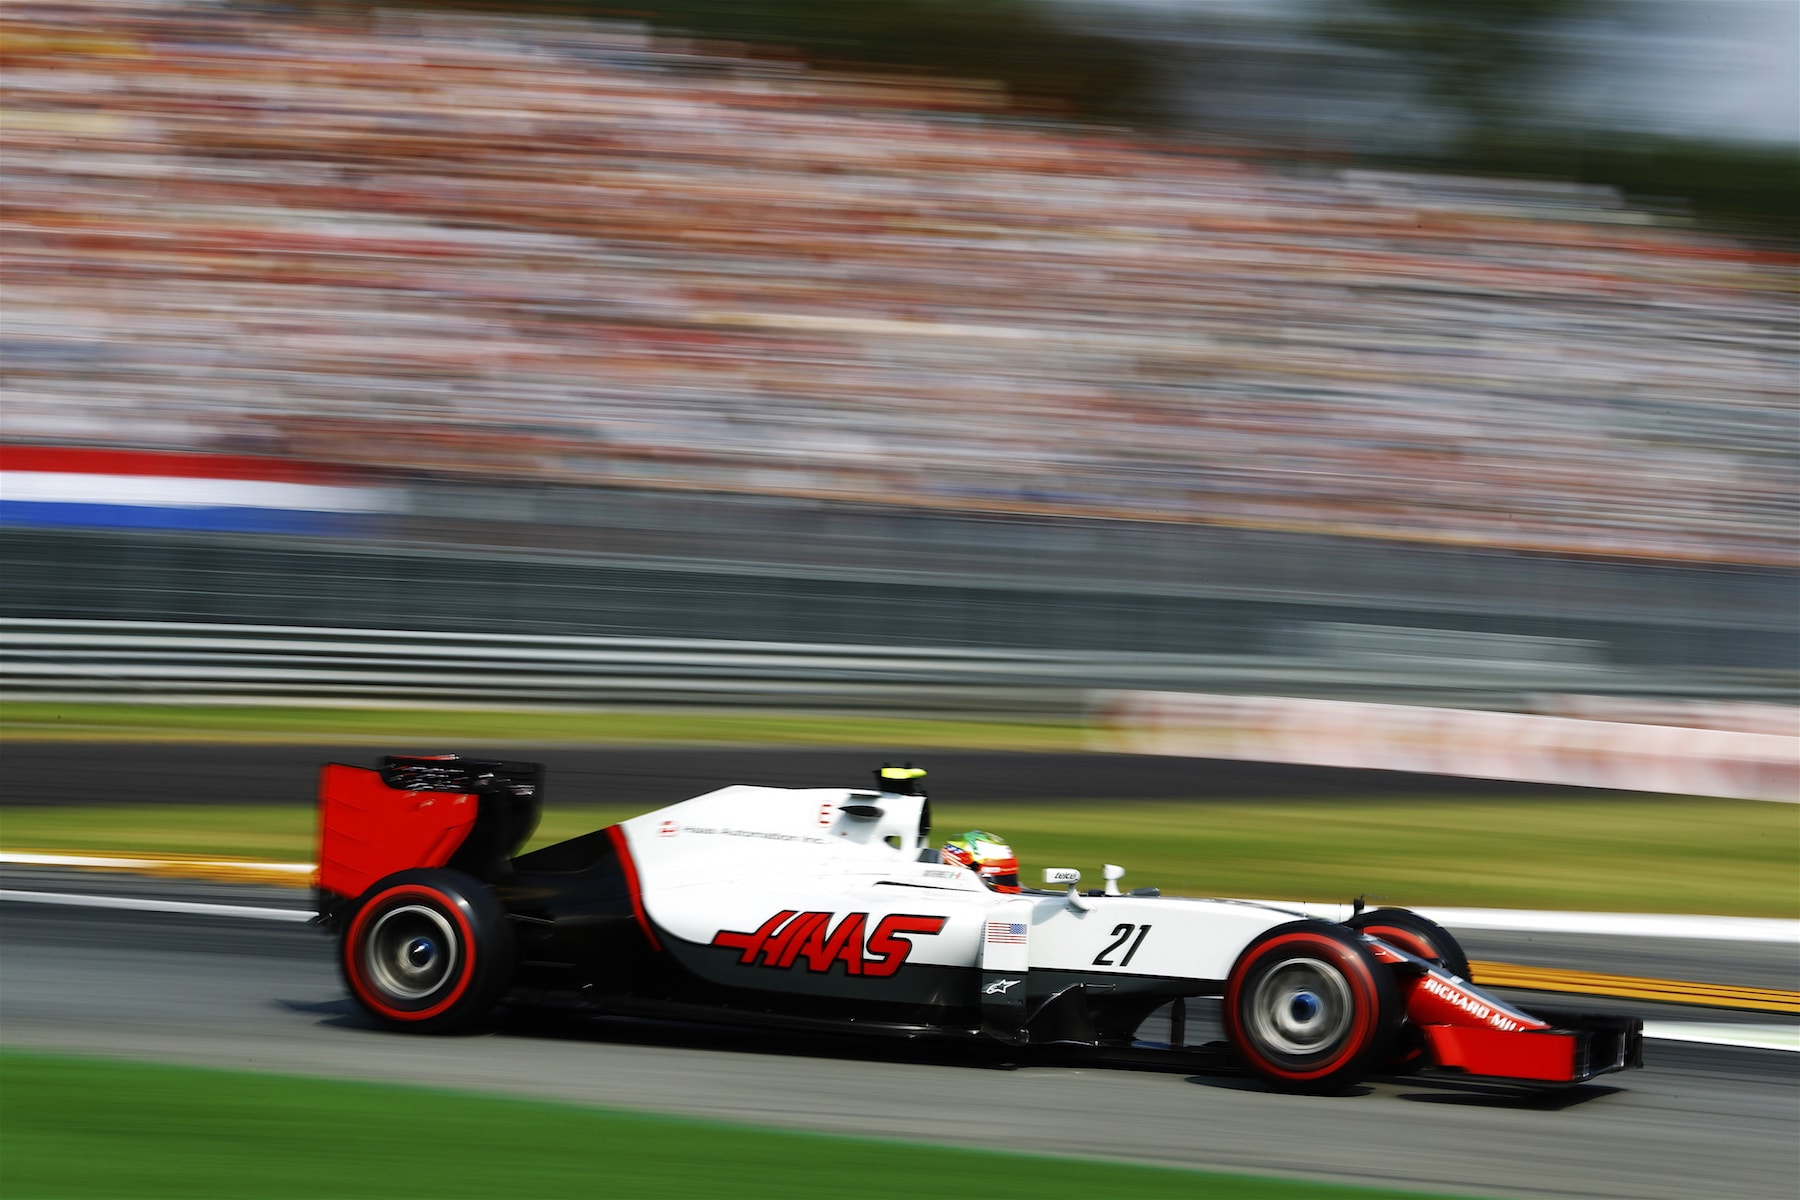 Salracing - Esteban Gutierrez | Haas F1 Team